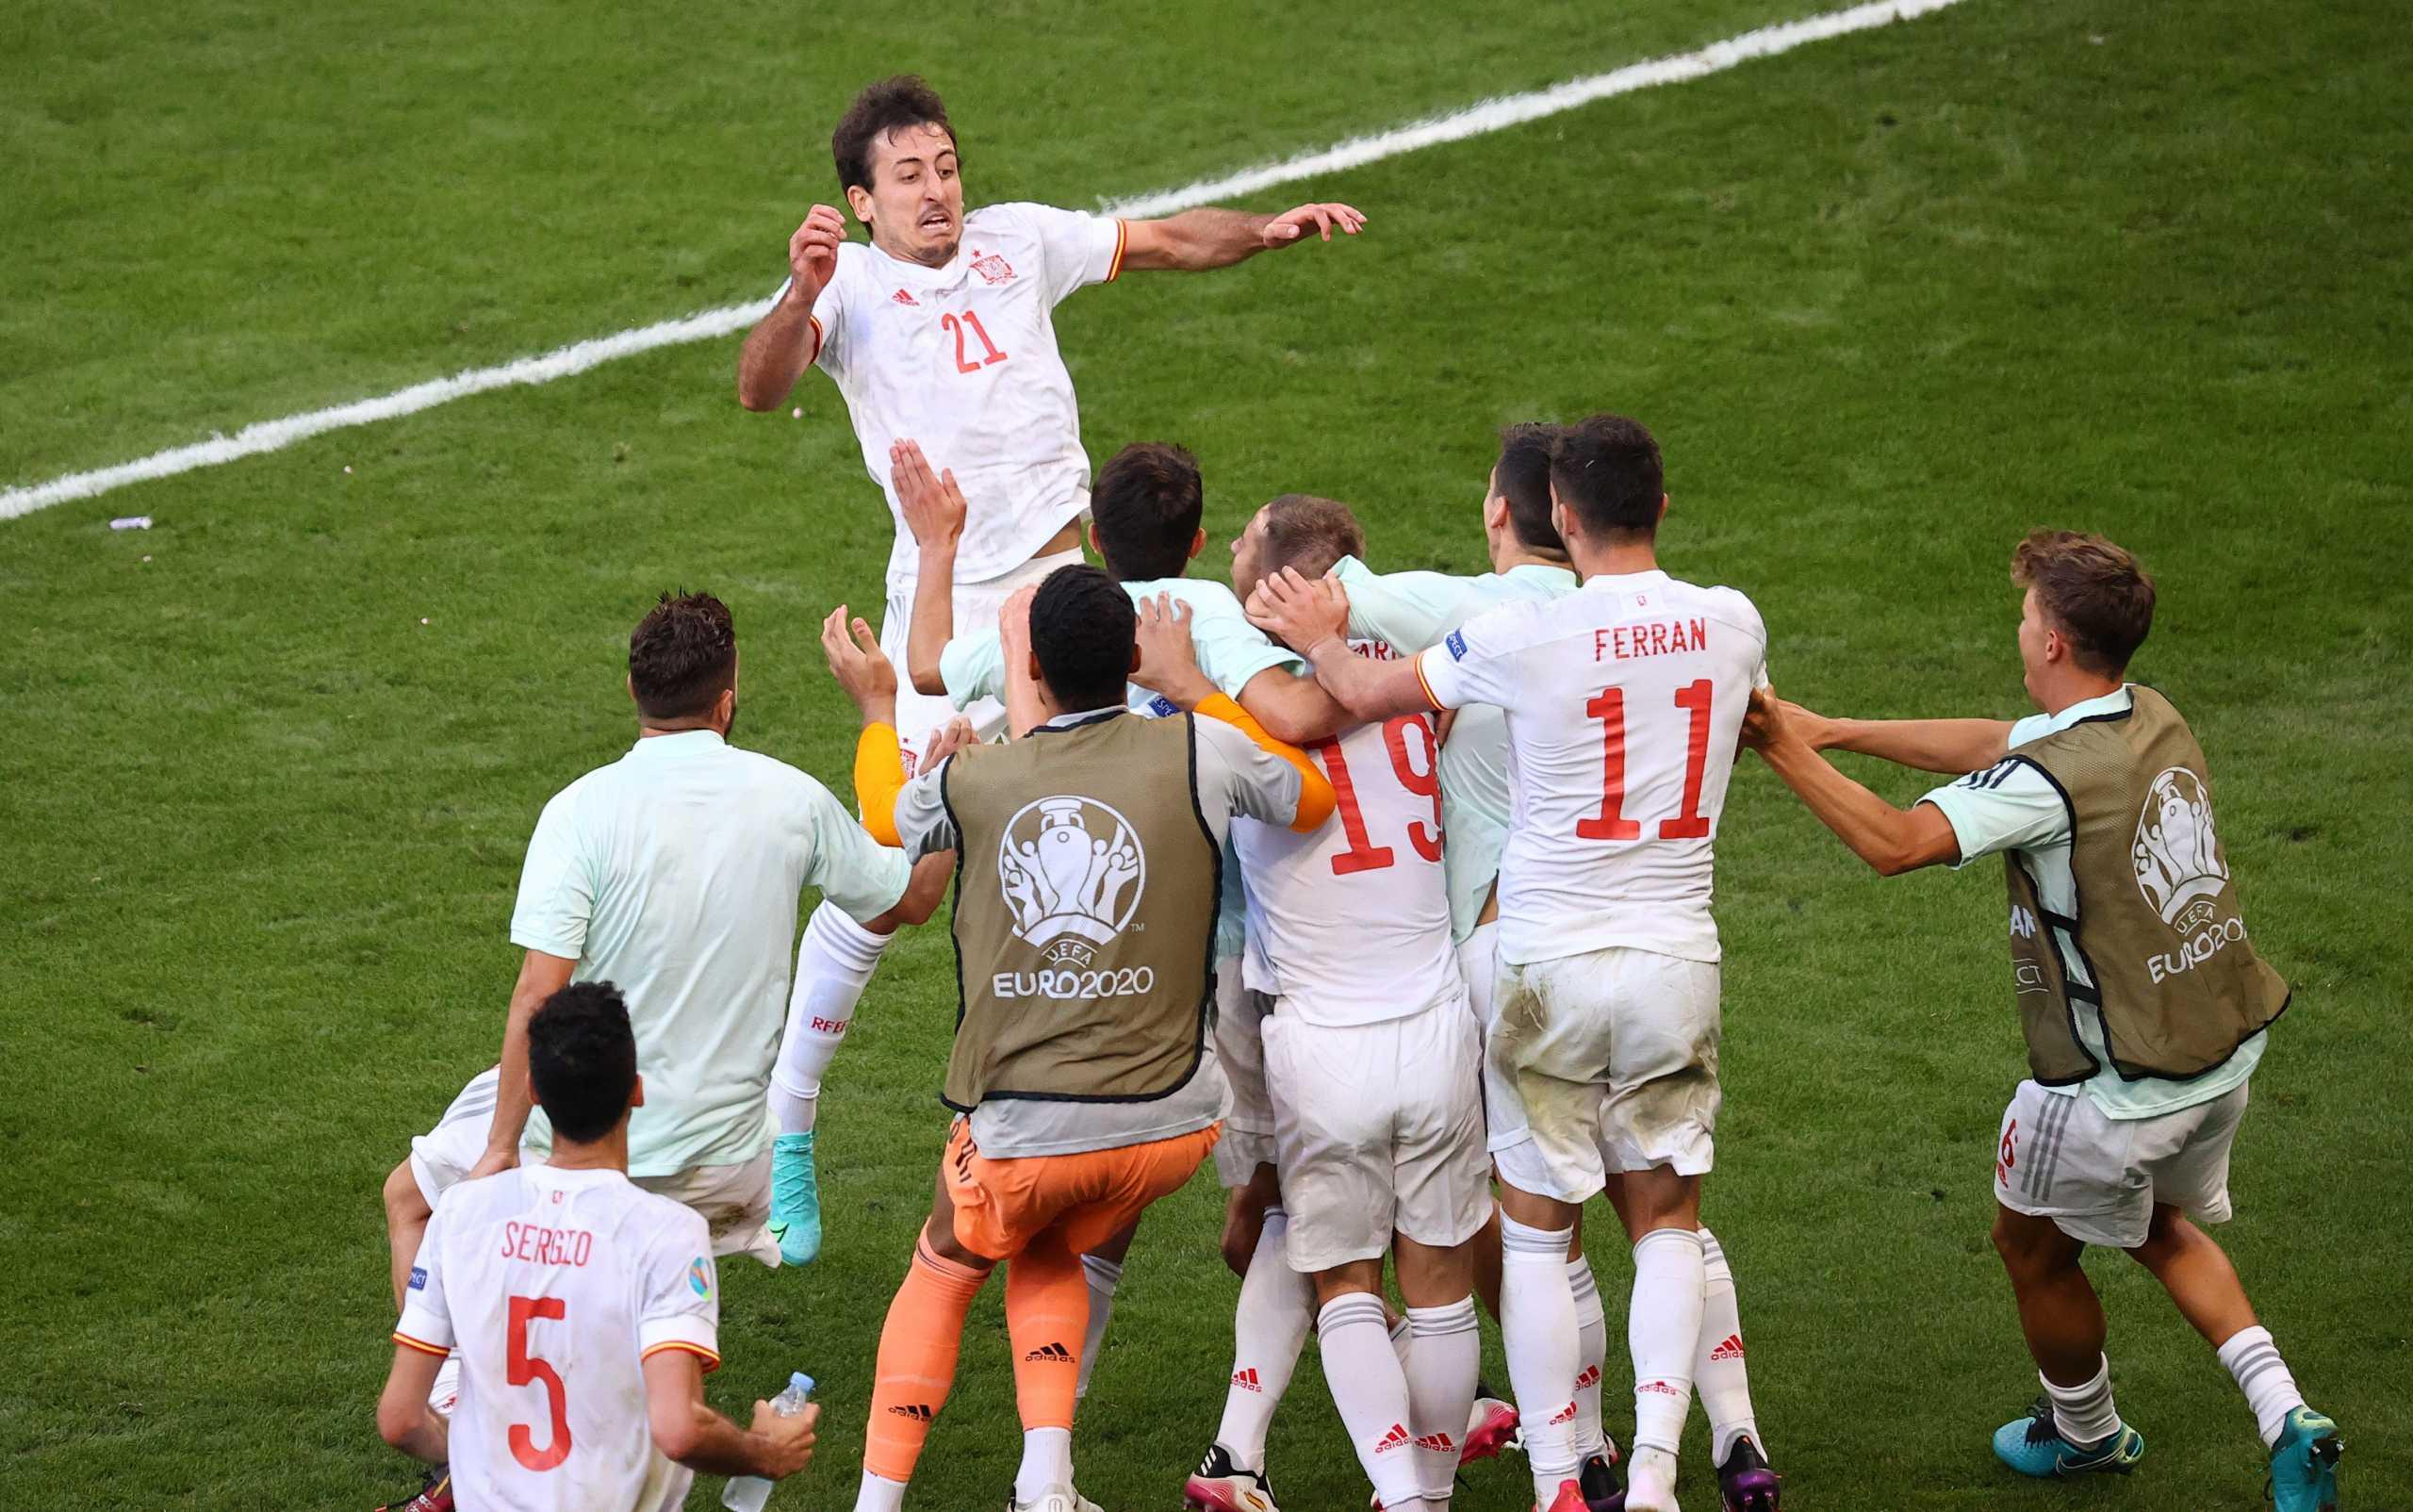 Euro 2020, Κροατία – Ισπανία 3-5: Ιστορική ματσάρα και πρόκριση θρίλερ για τους Ισπανούς